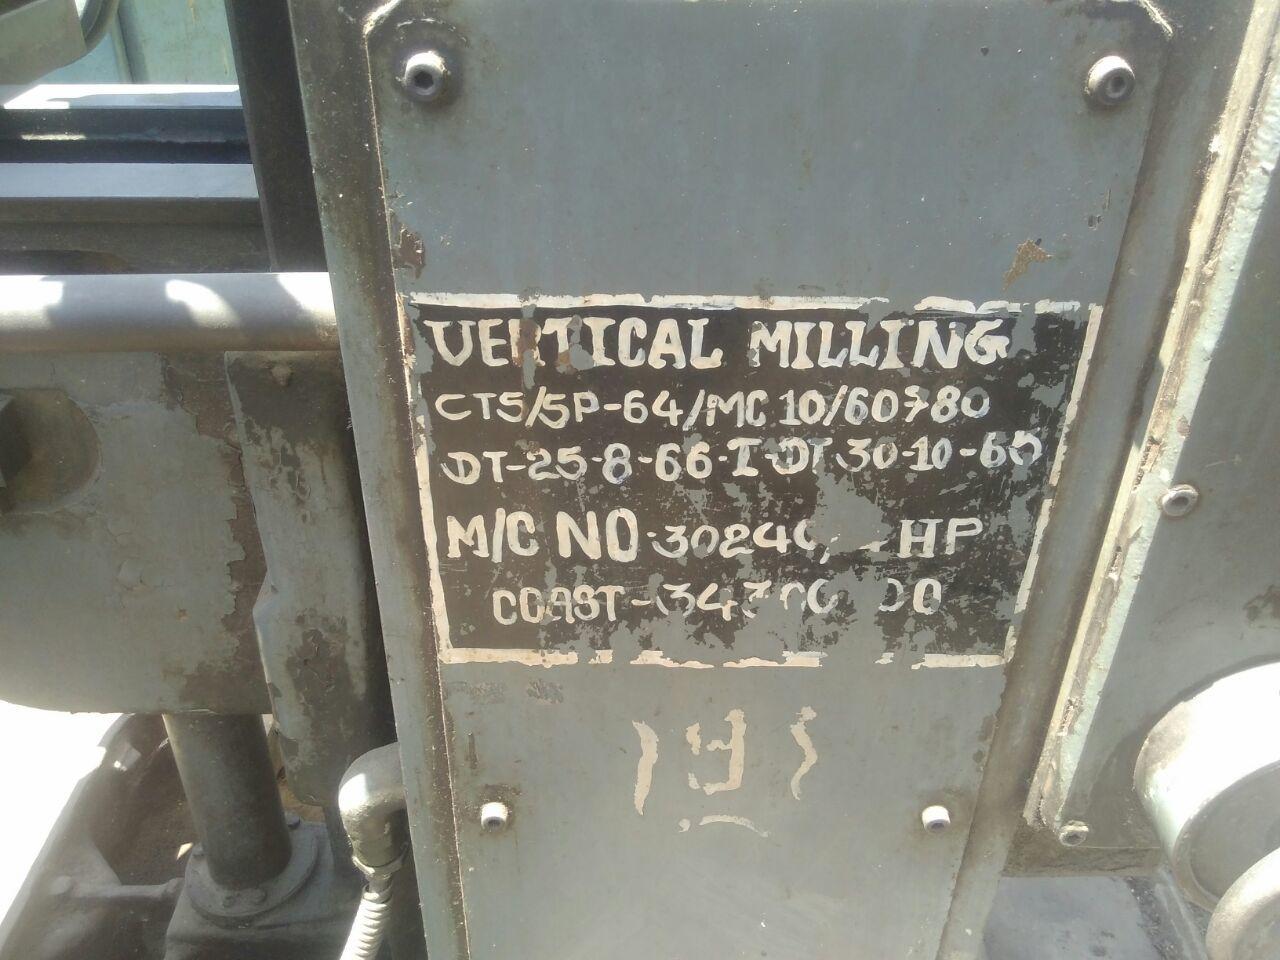 11.vertical milling 1